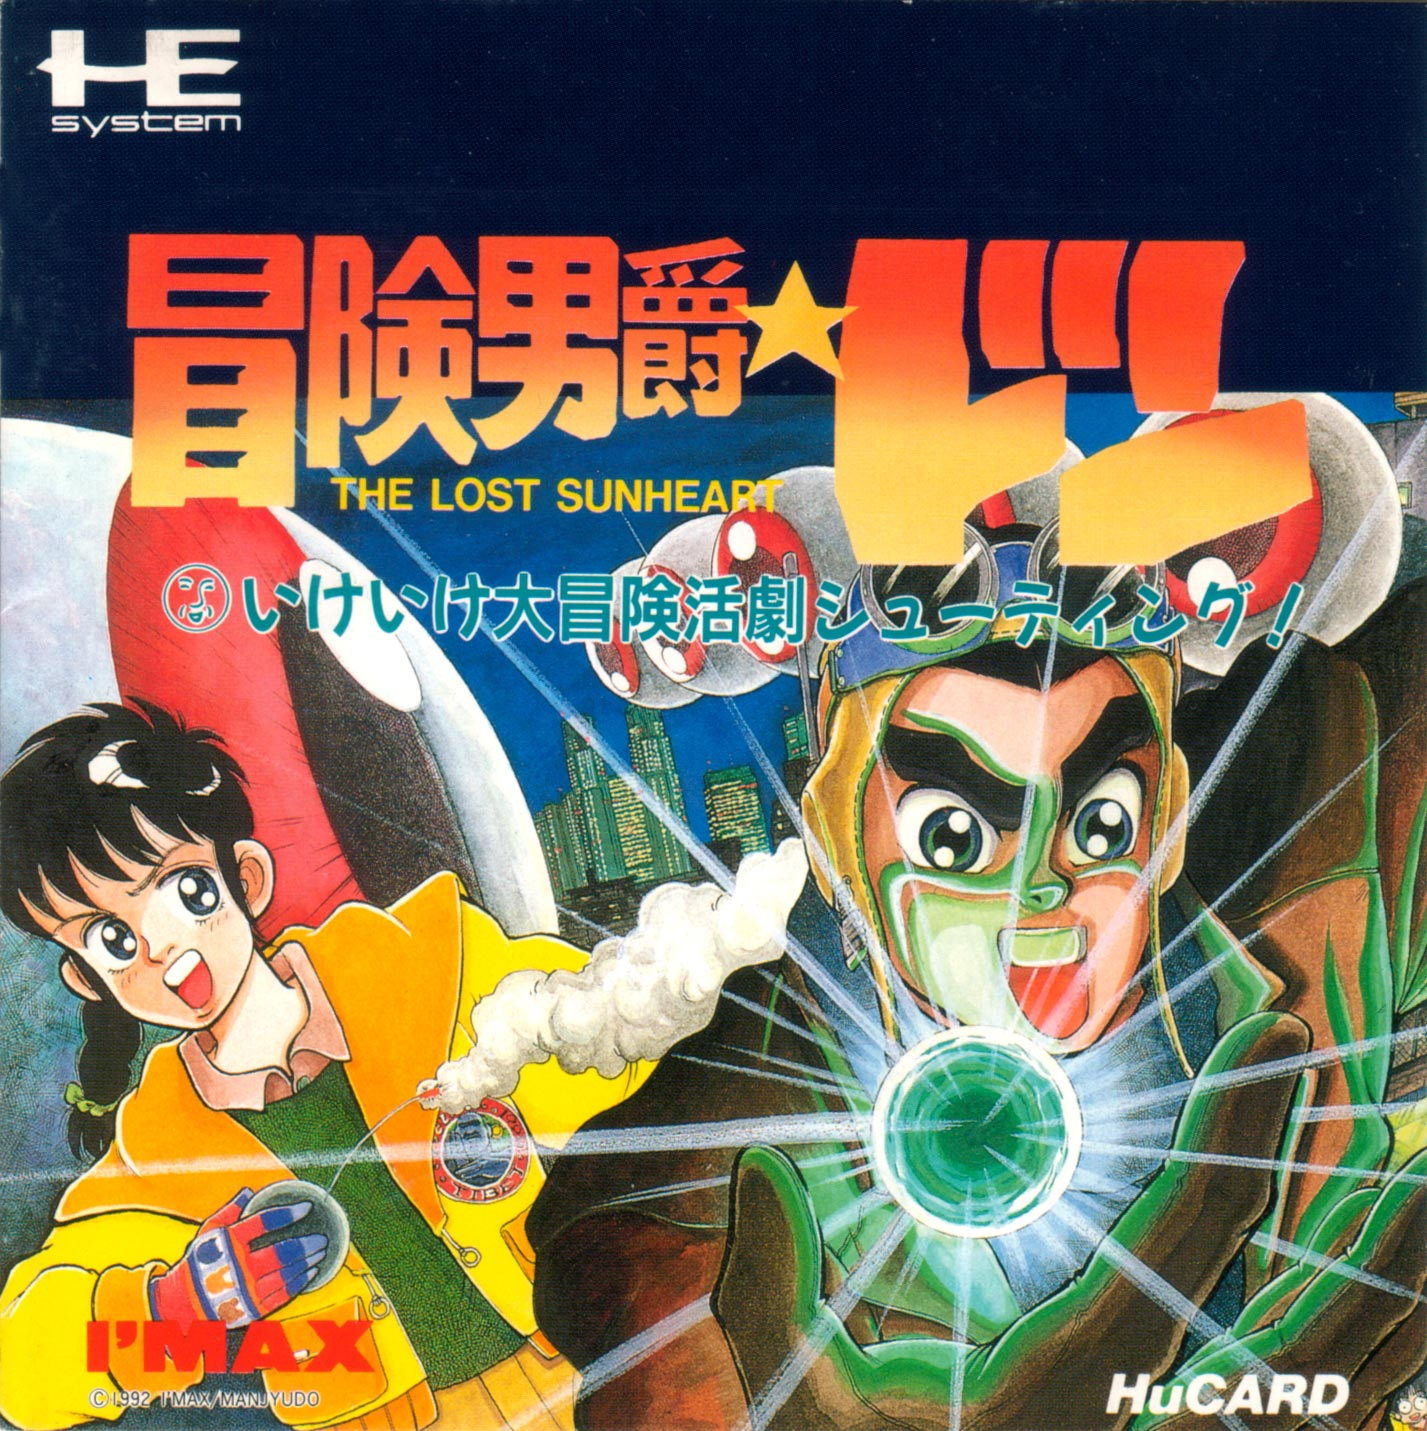 Bōken Danshaken Don - Sun=Heart Hen - The PC Engine Software